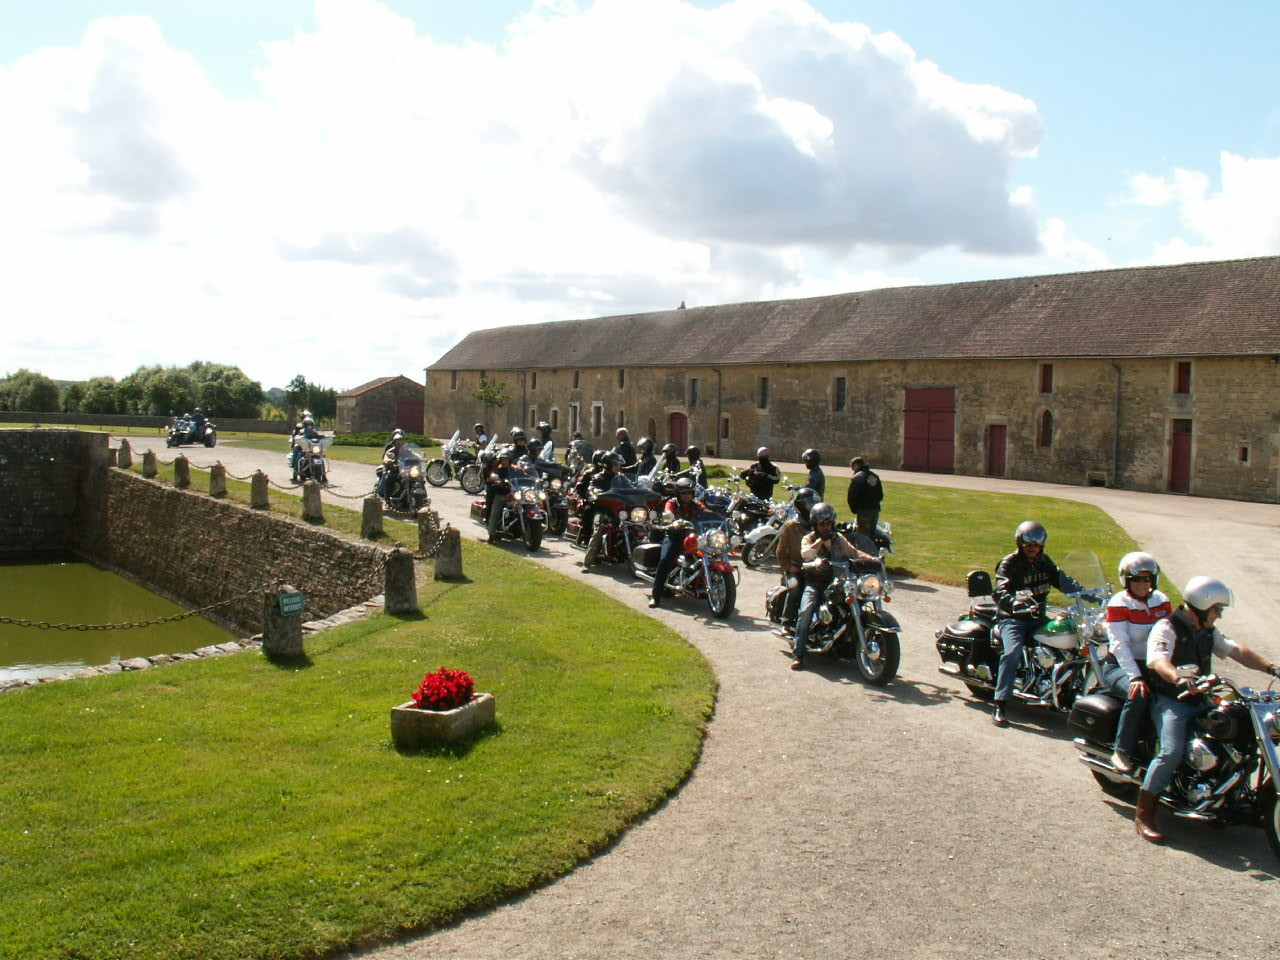 13/18 - Rallye Motos Harley-Davidson - Château de Saveilles ©photo-propriétaire